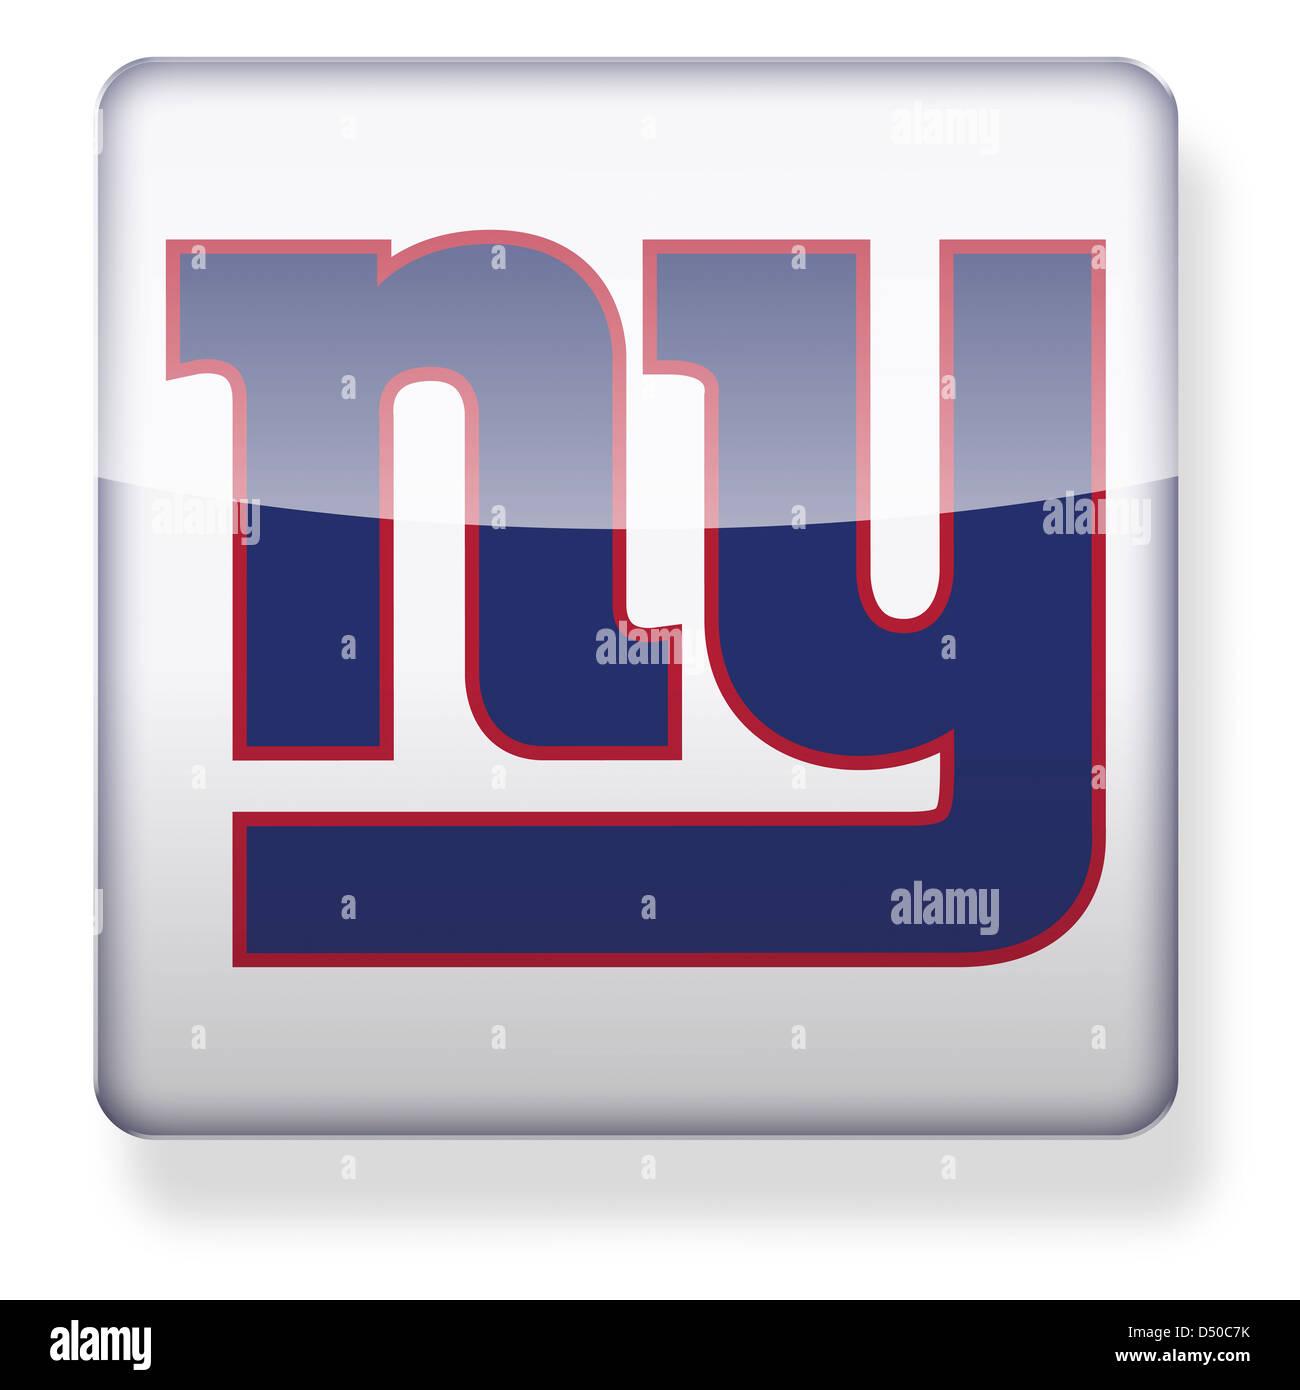 New York Giants Logo Stock Photos New York Giants Logo